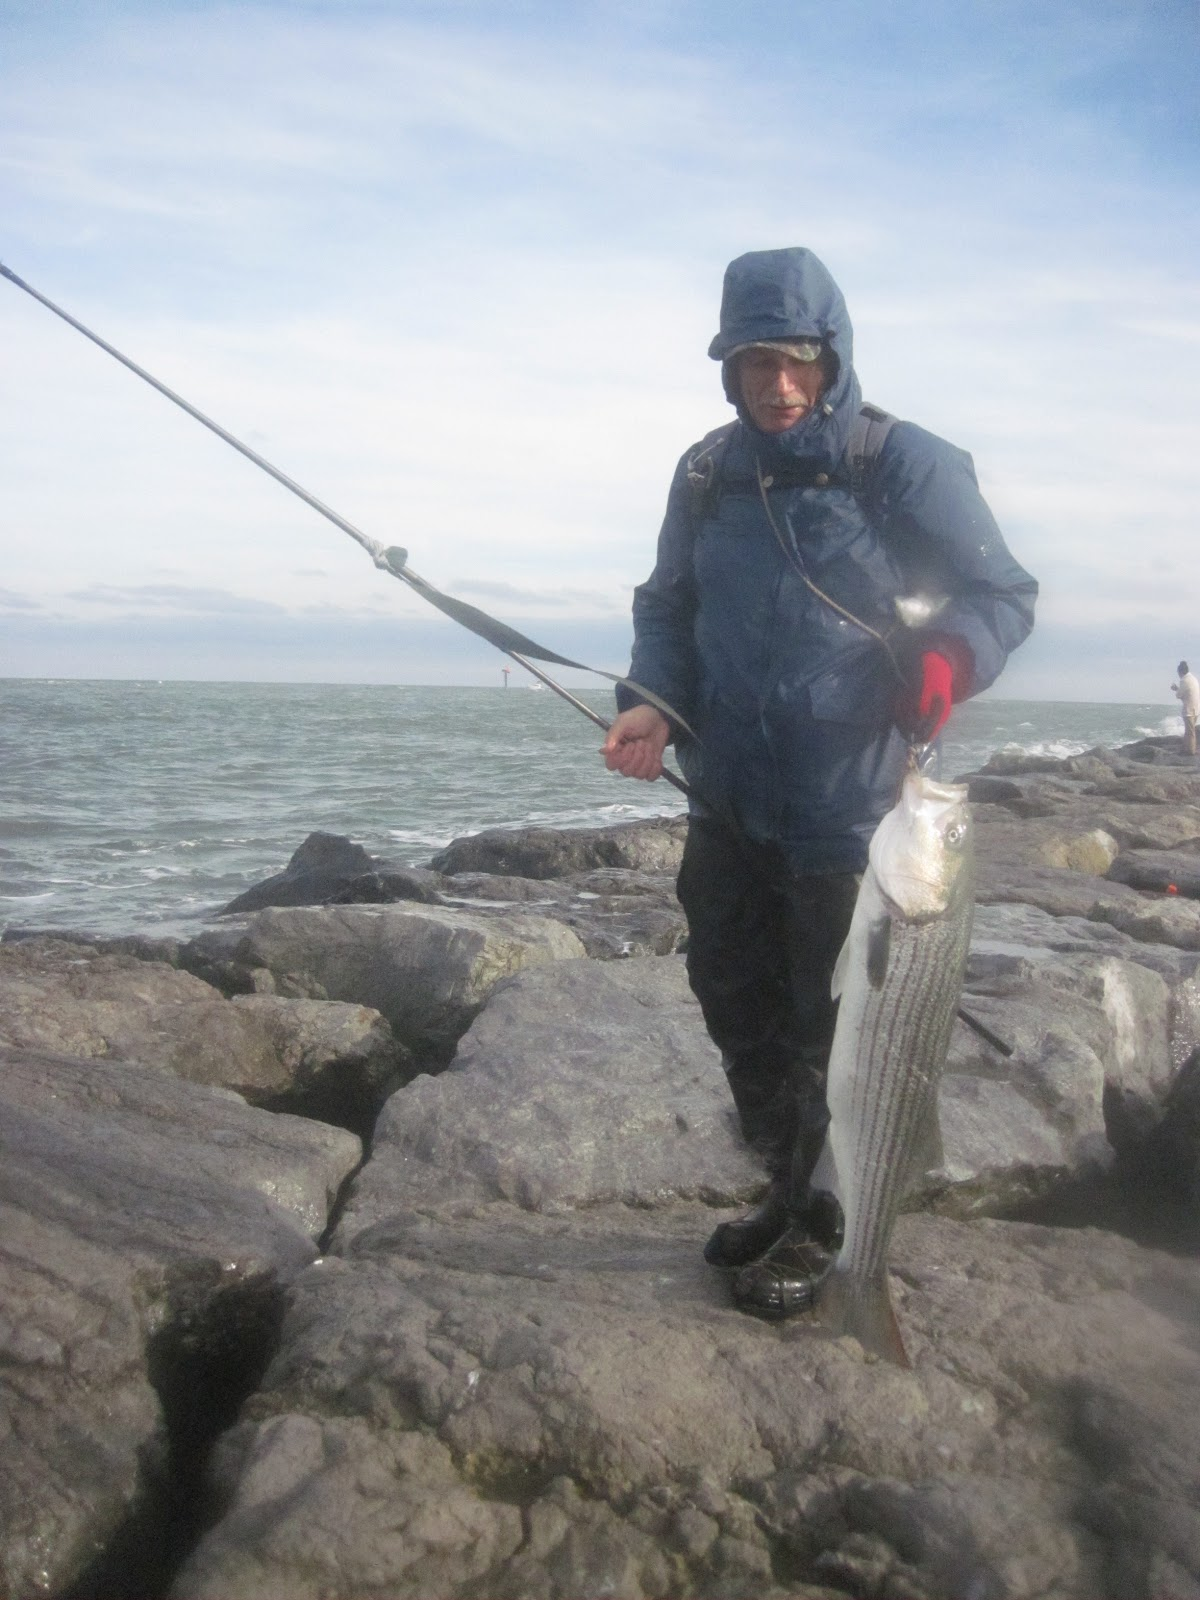 New jersey fishing report fishing new jersey nj for Fishing report nj